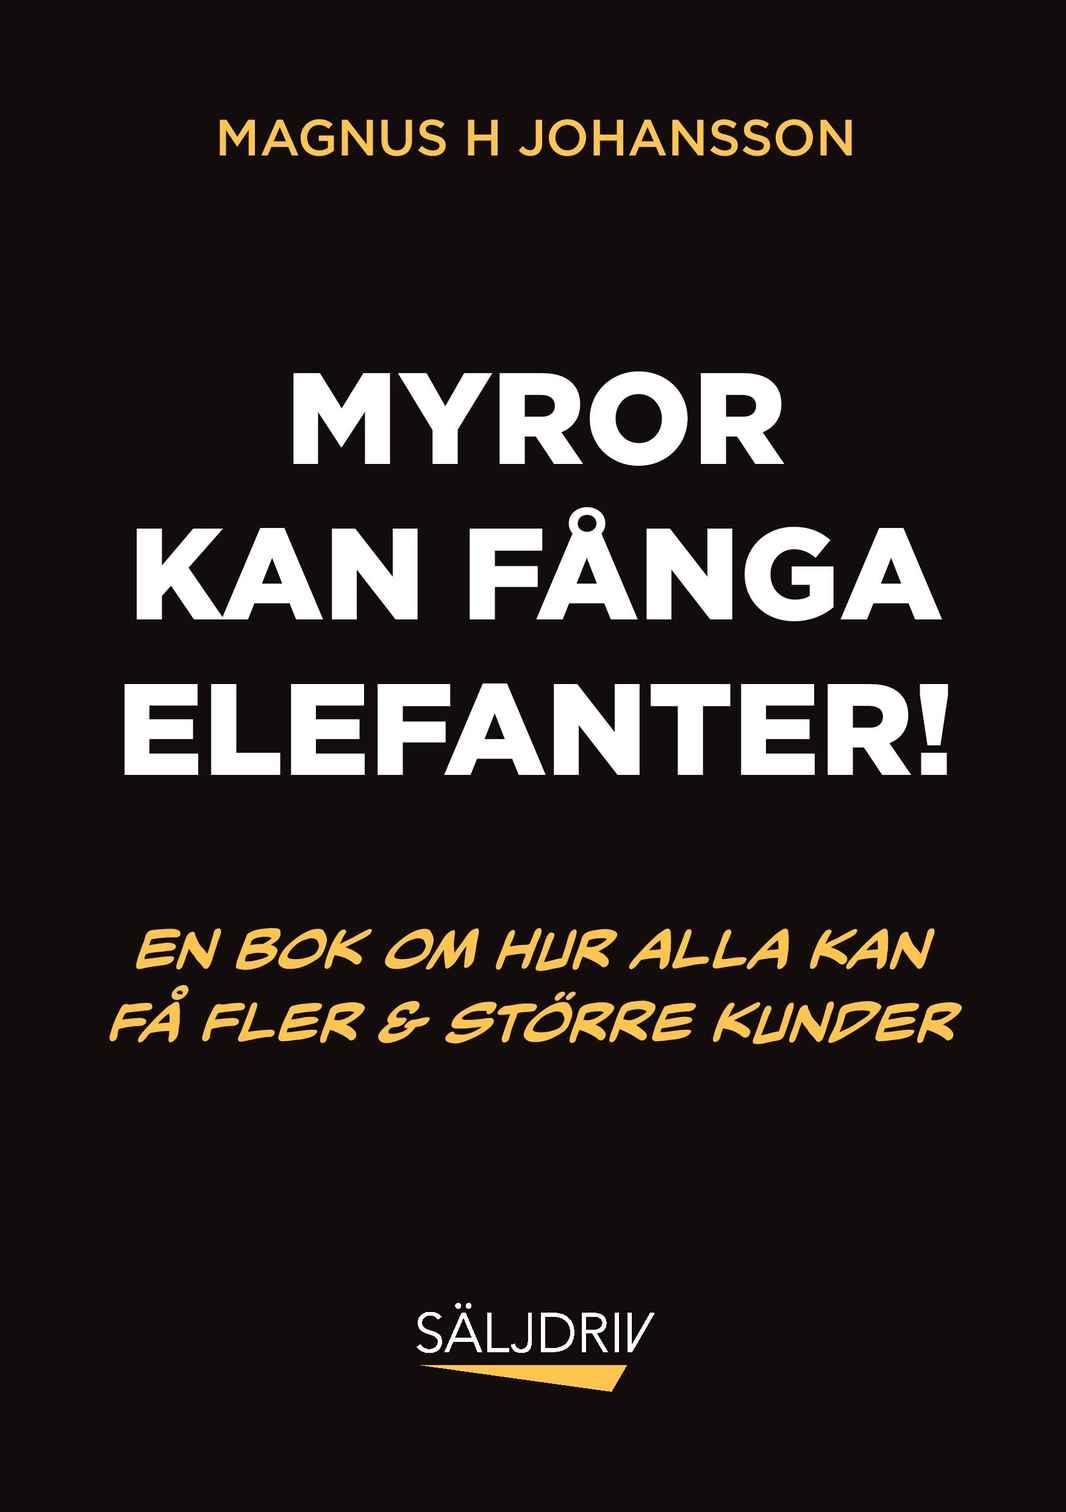 omslag framsida_myror kan fånga elefanter_upplag 2_magnus h johansson-page-001